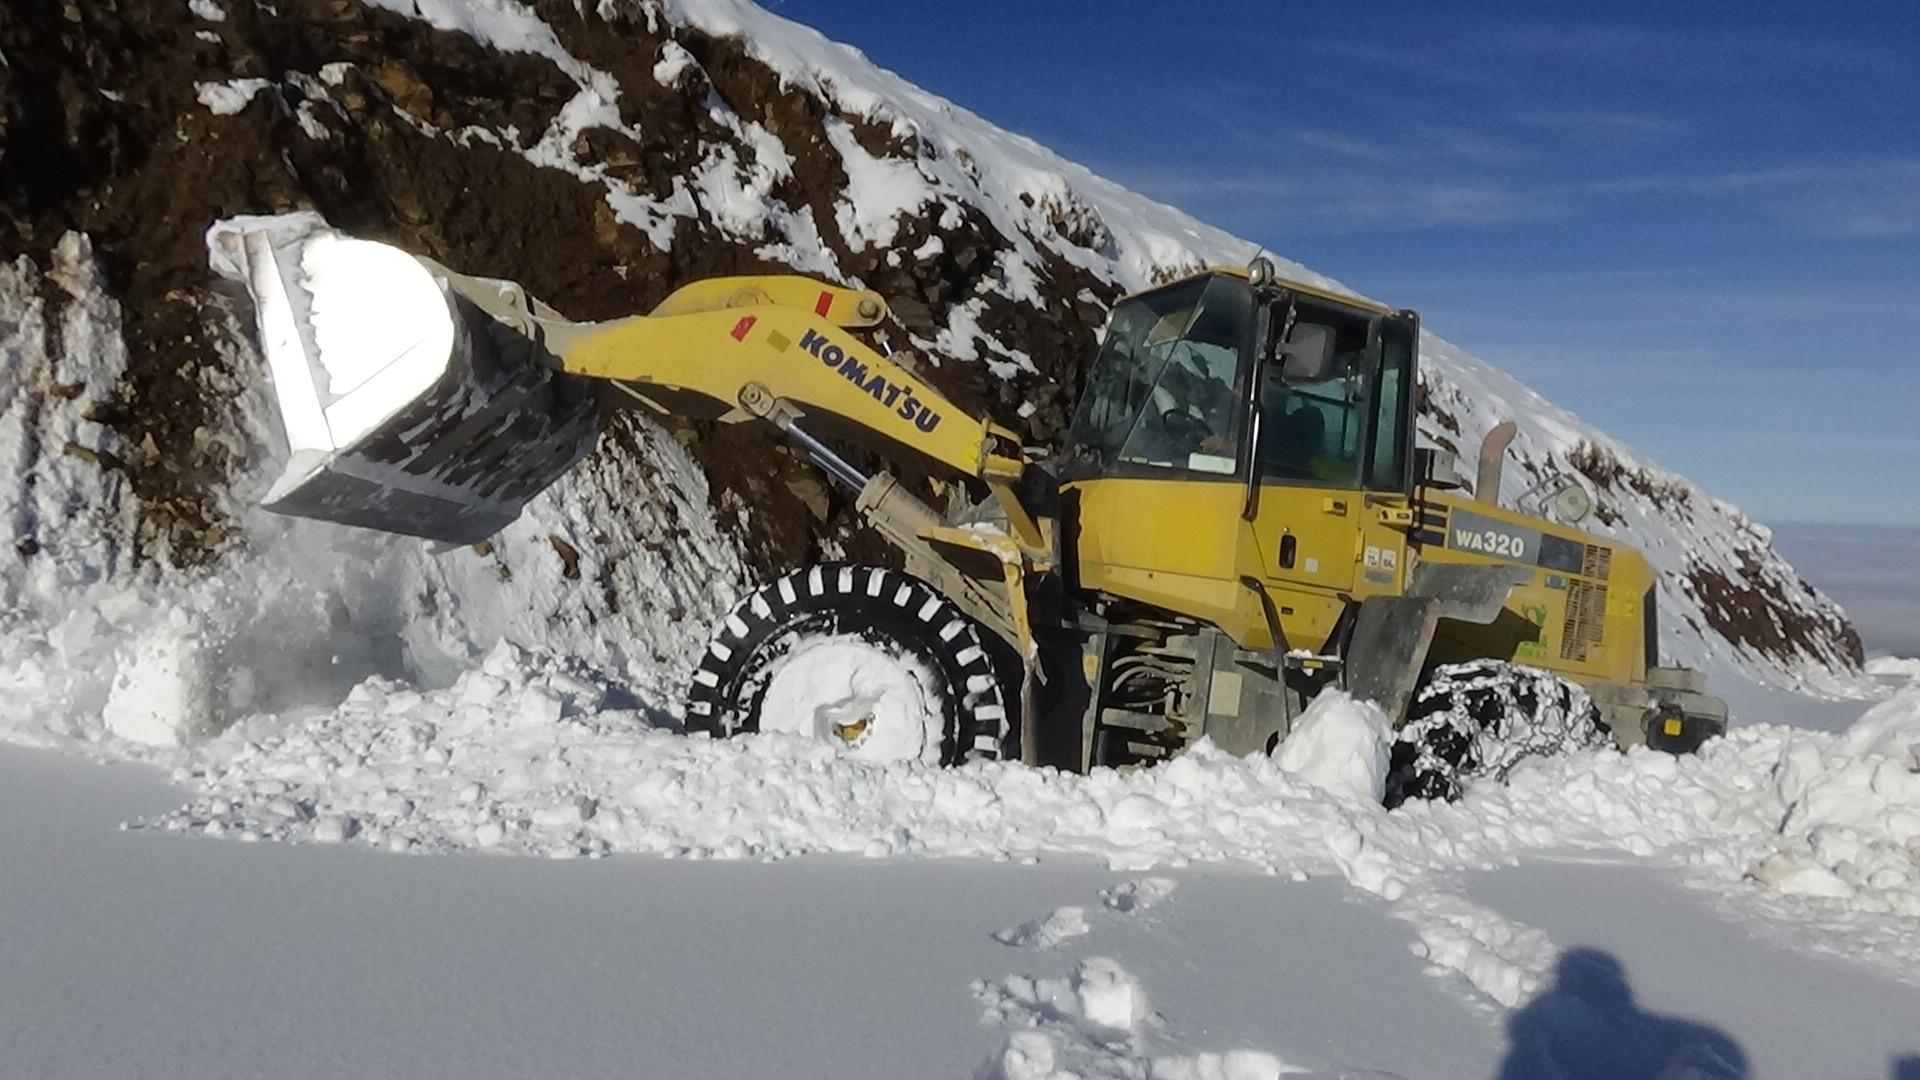 Muş'ta kardan dolayı kapanan 35 köy yolu ulaşıma açıldı